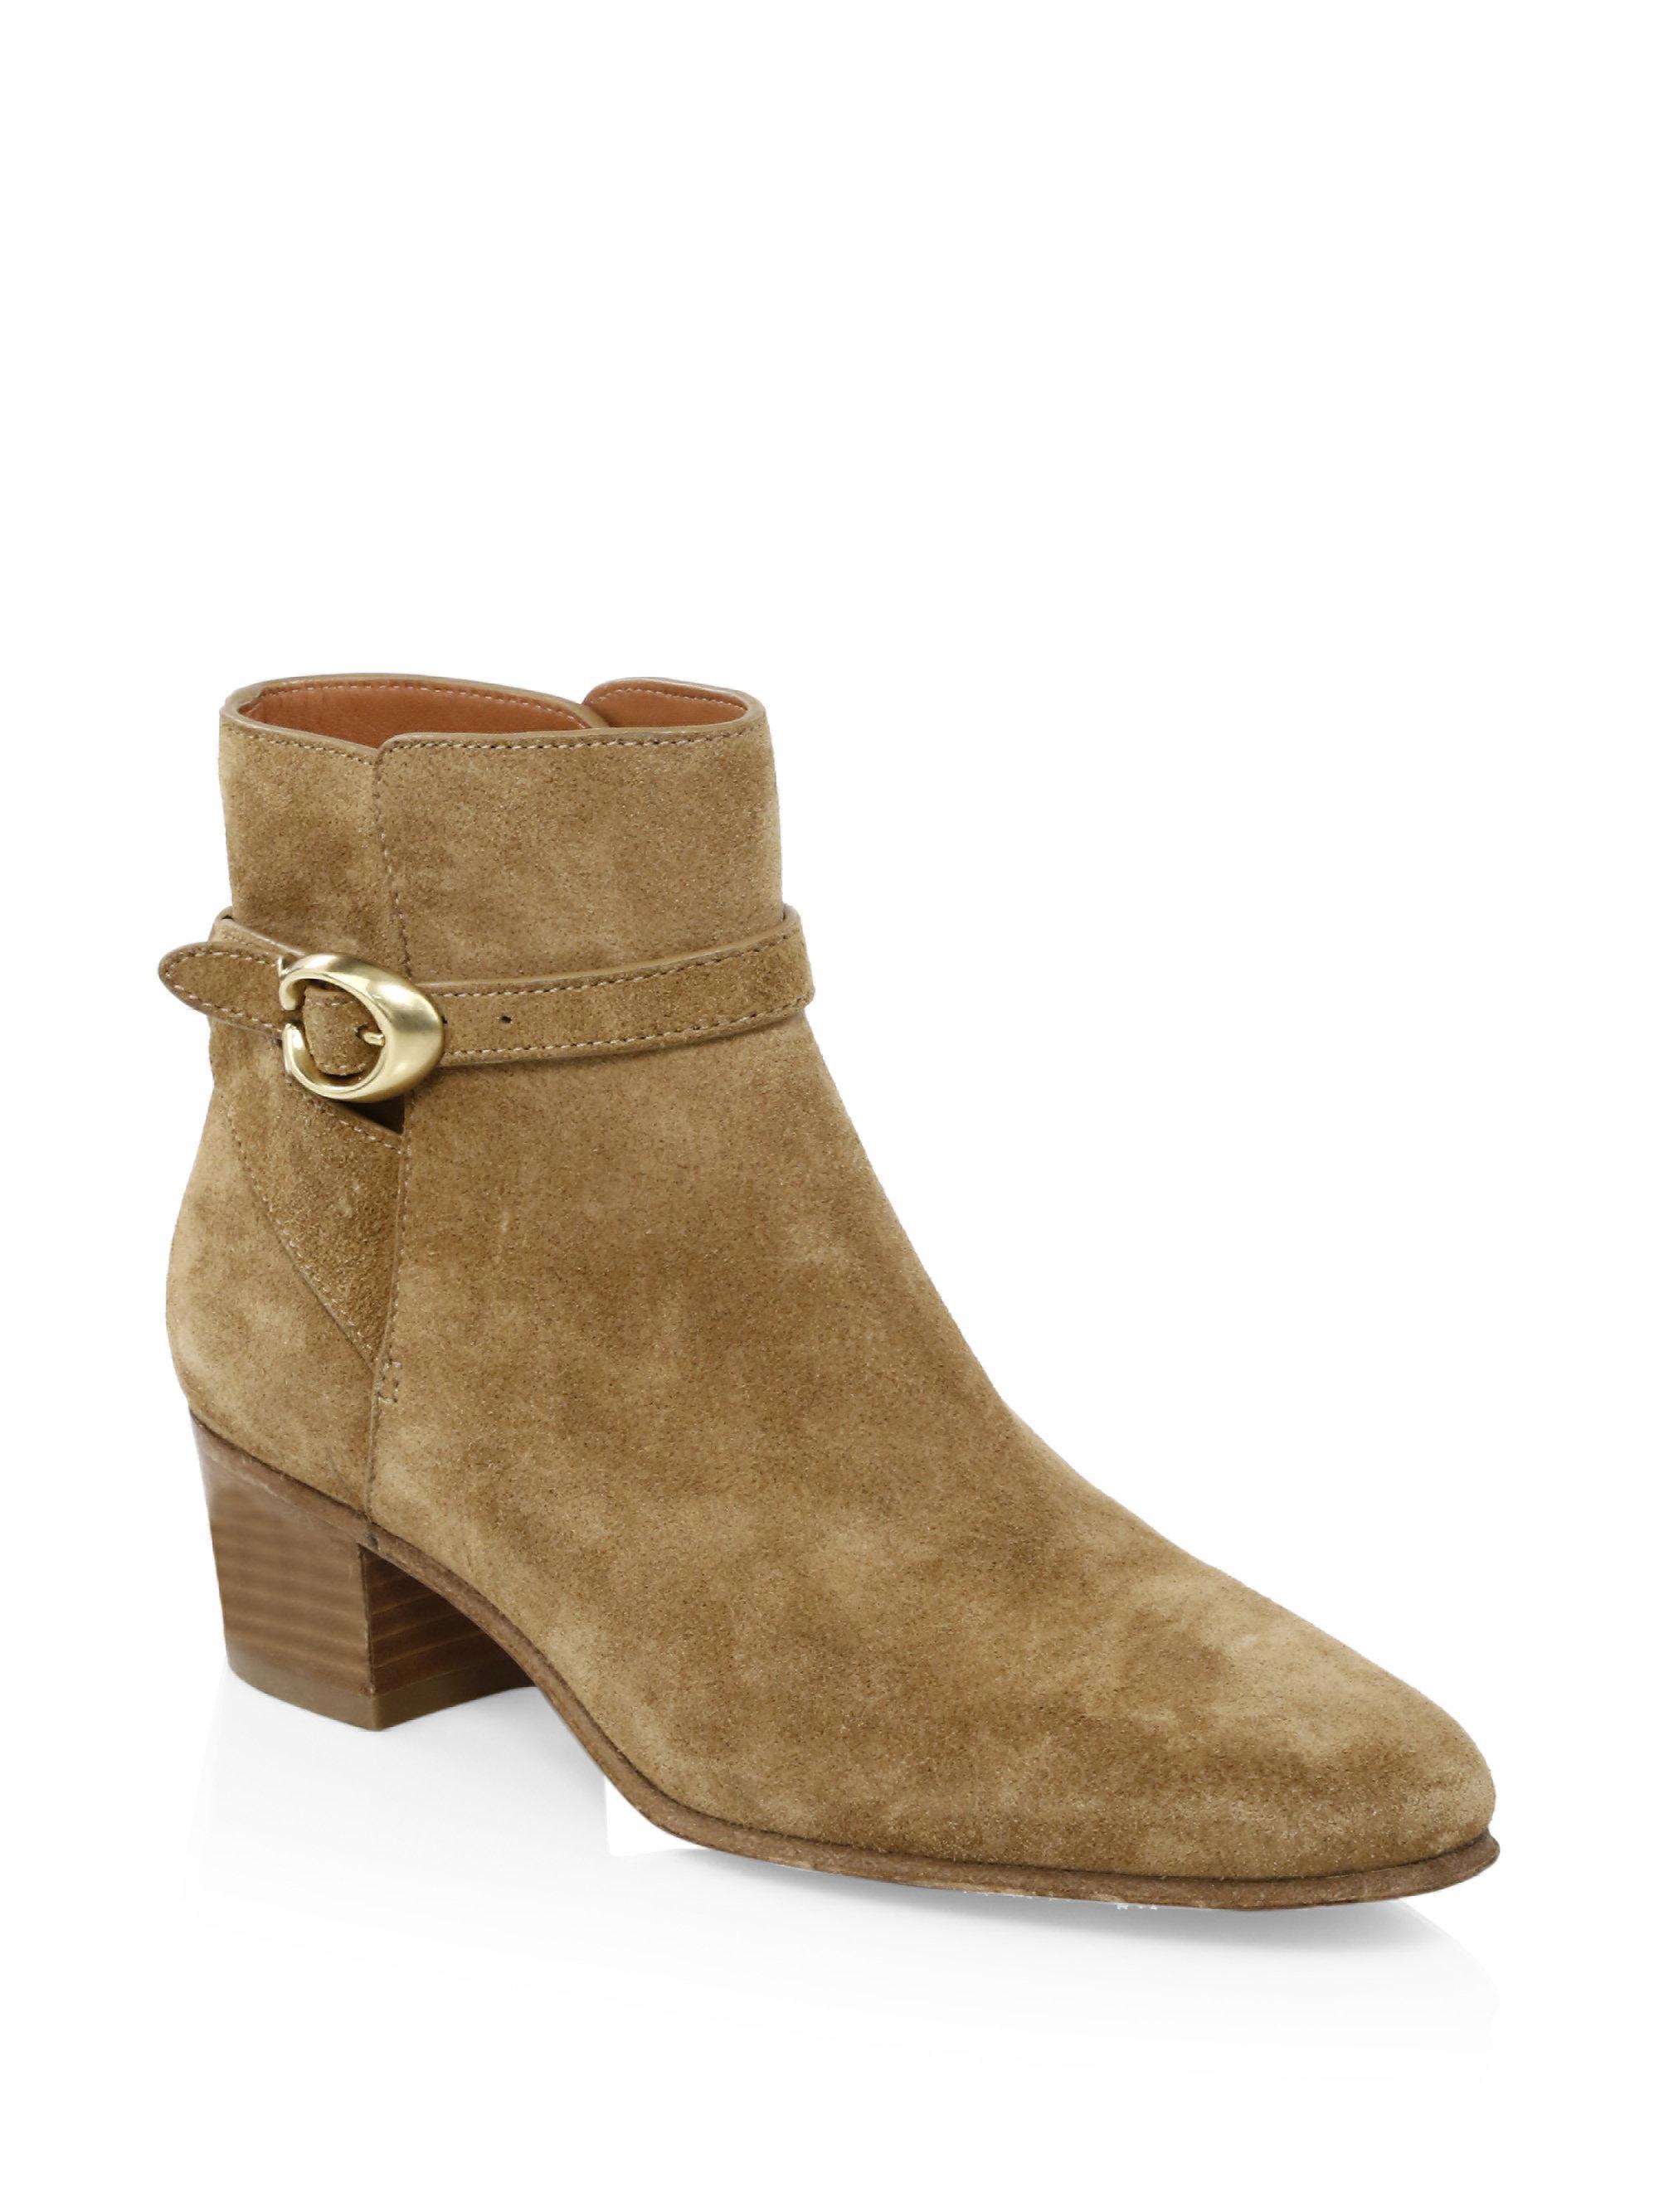 Coach CHRYSTIE - Ankle boots - peanut DcbTDWfA53